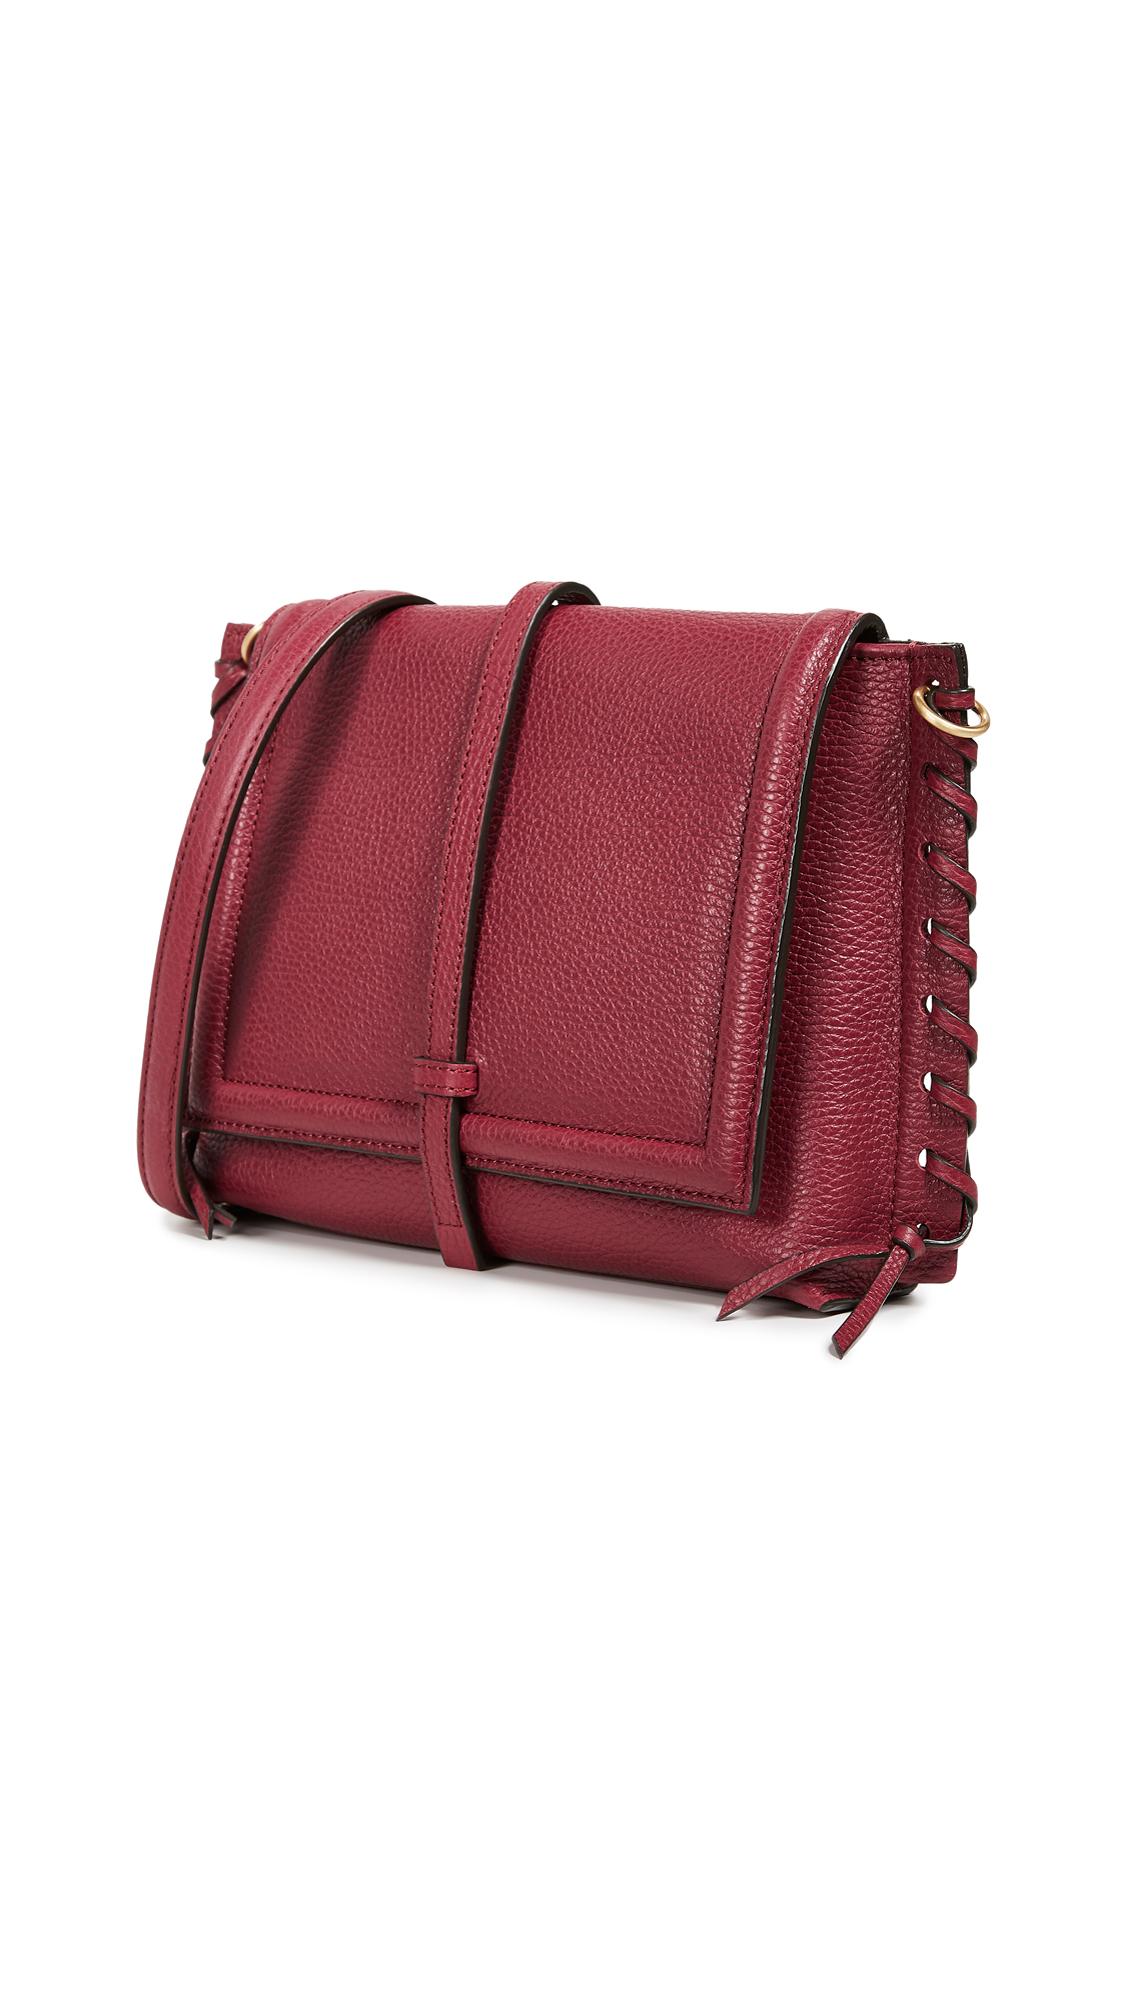 ANNABEL INGALL Elizabeth Saddle Bag in Barberry